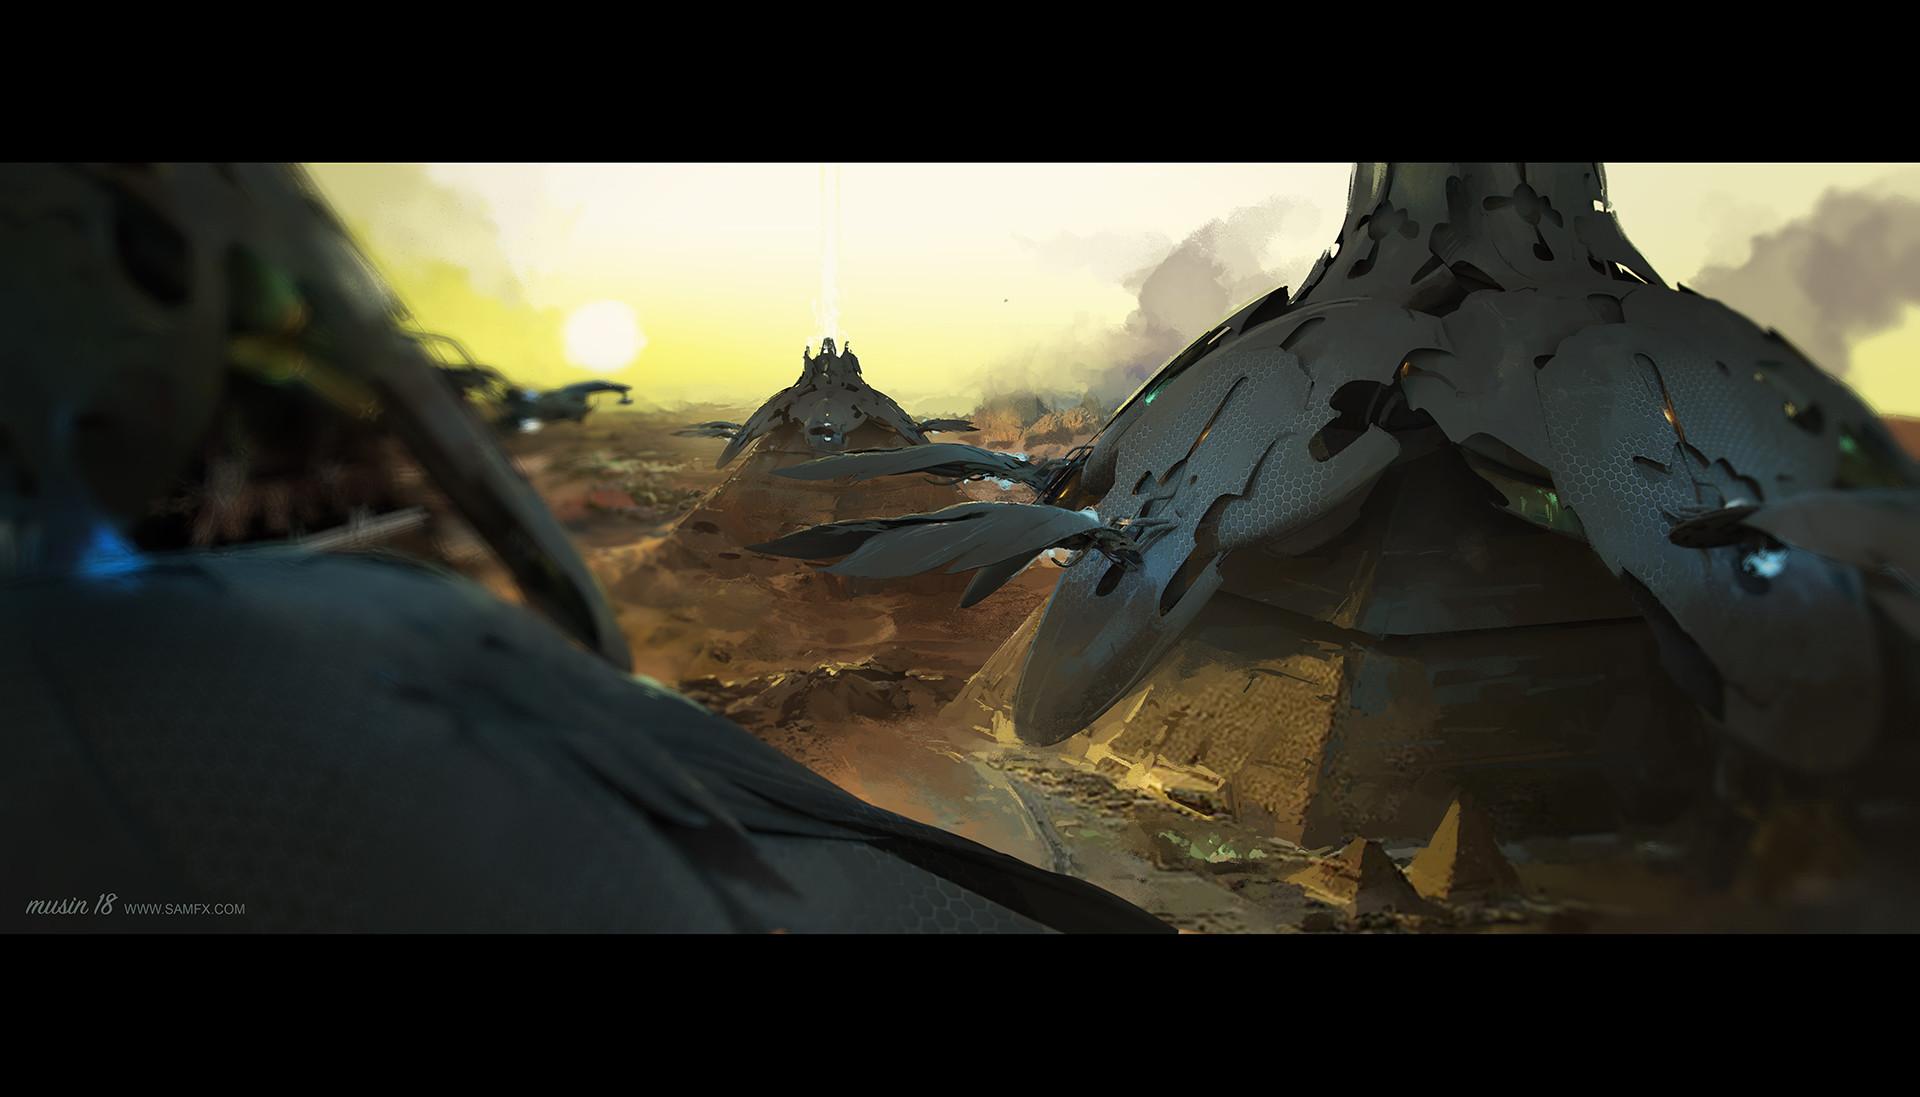 Sergey musin shiva fleet over the pyramids ver1